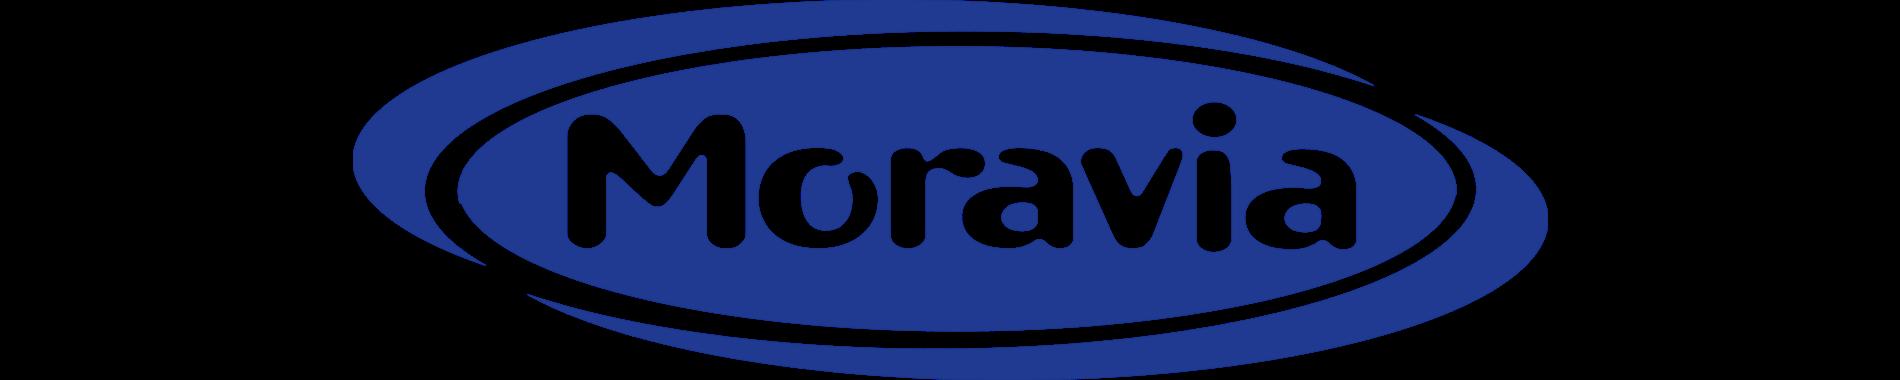 Moravia-logo